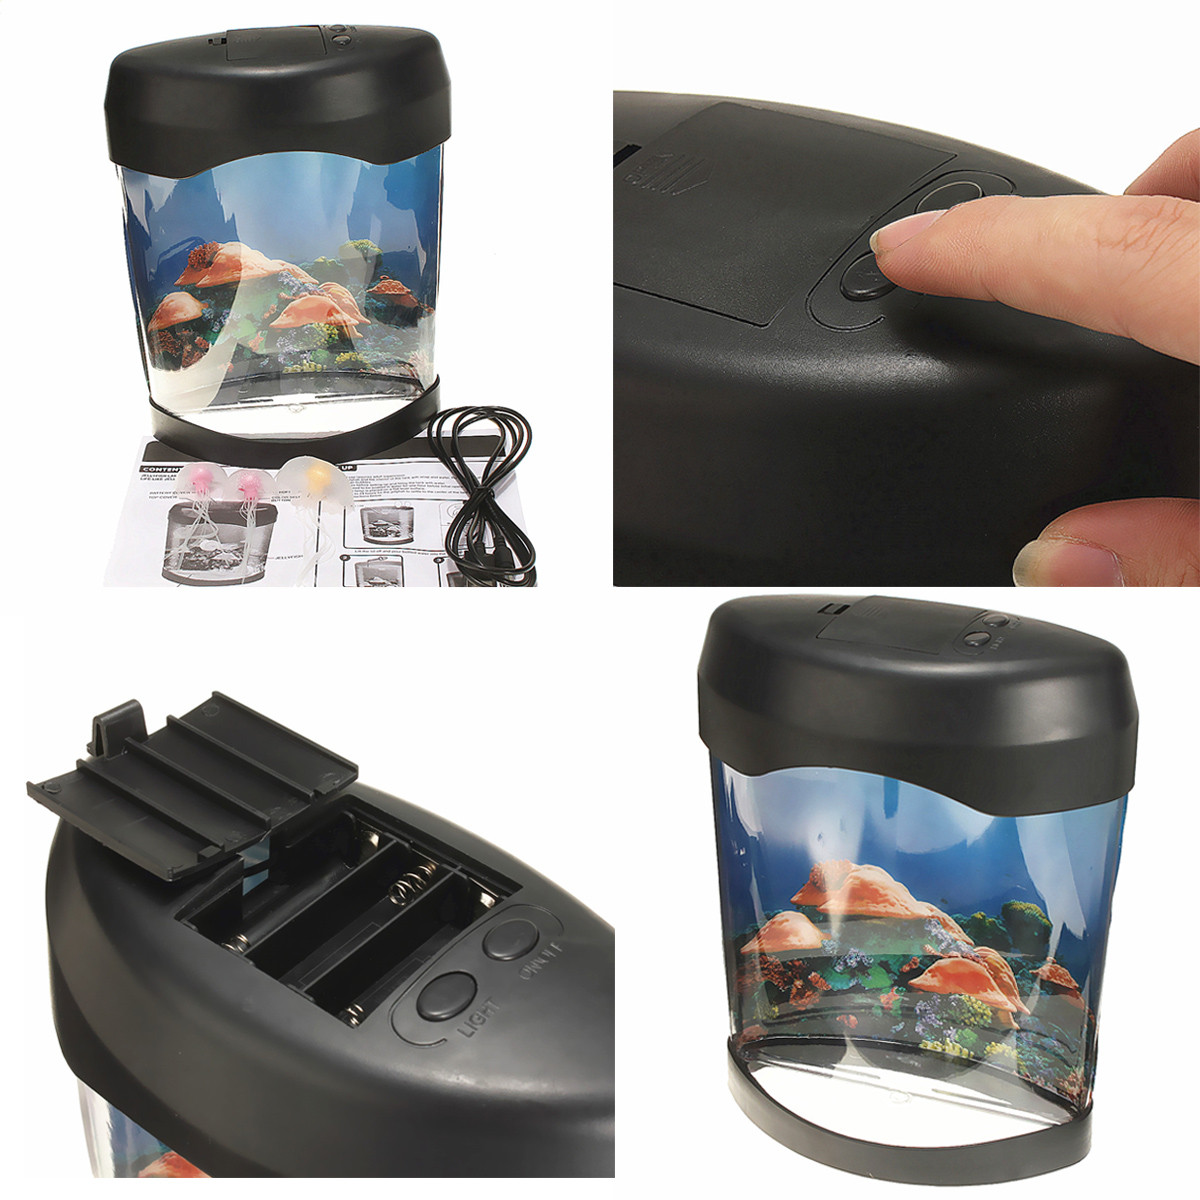 Tank World Nightlight Light Lamp Swimming Jellyfish Sea Led Mood vn0N8mw